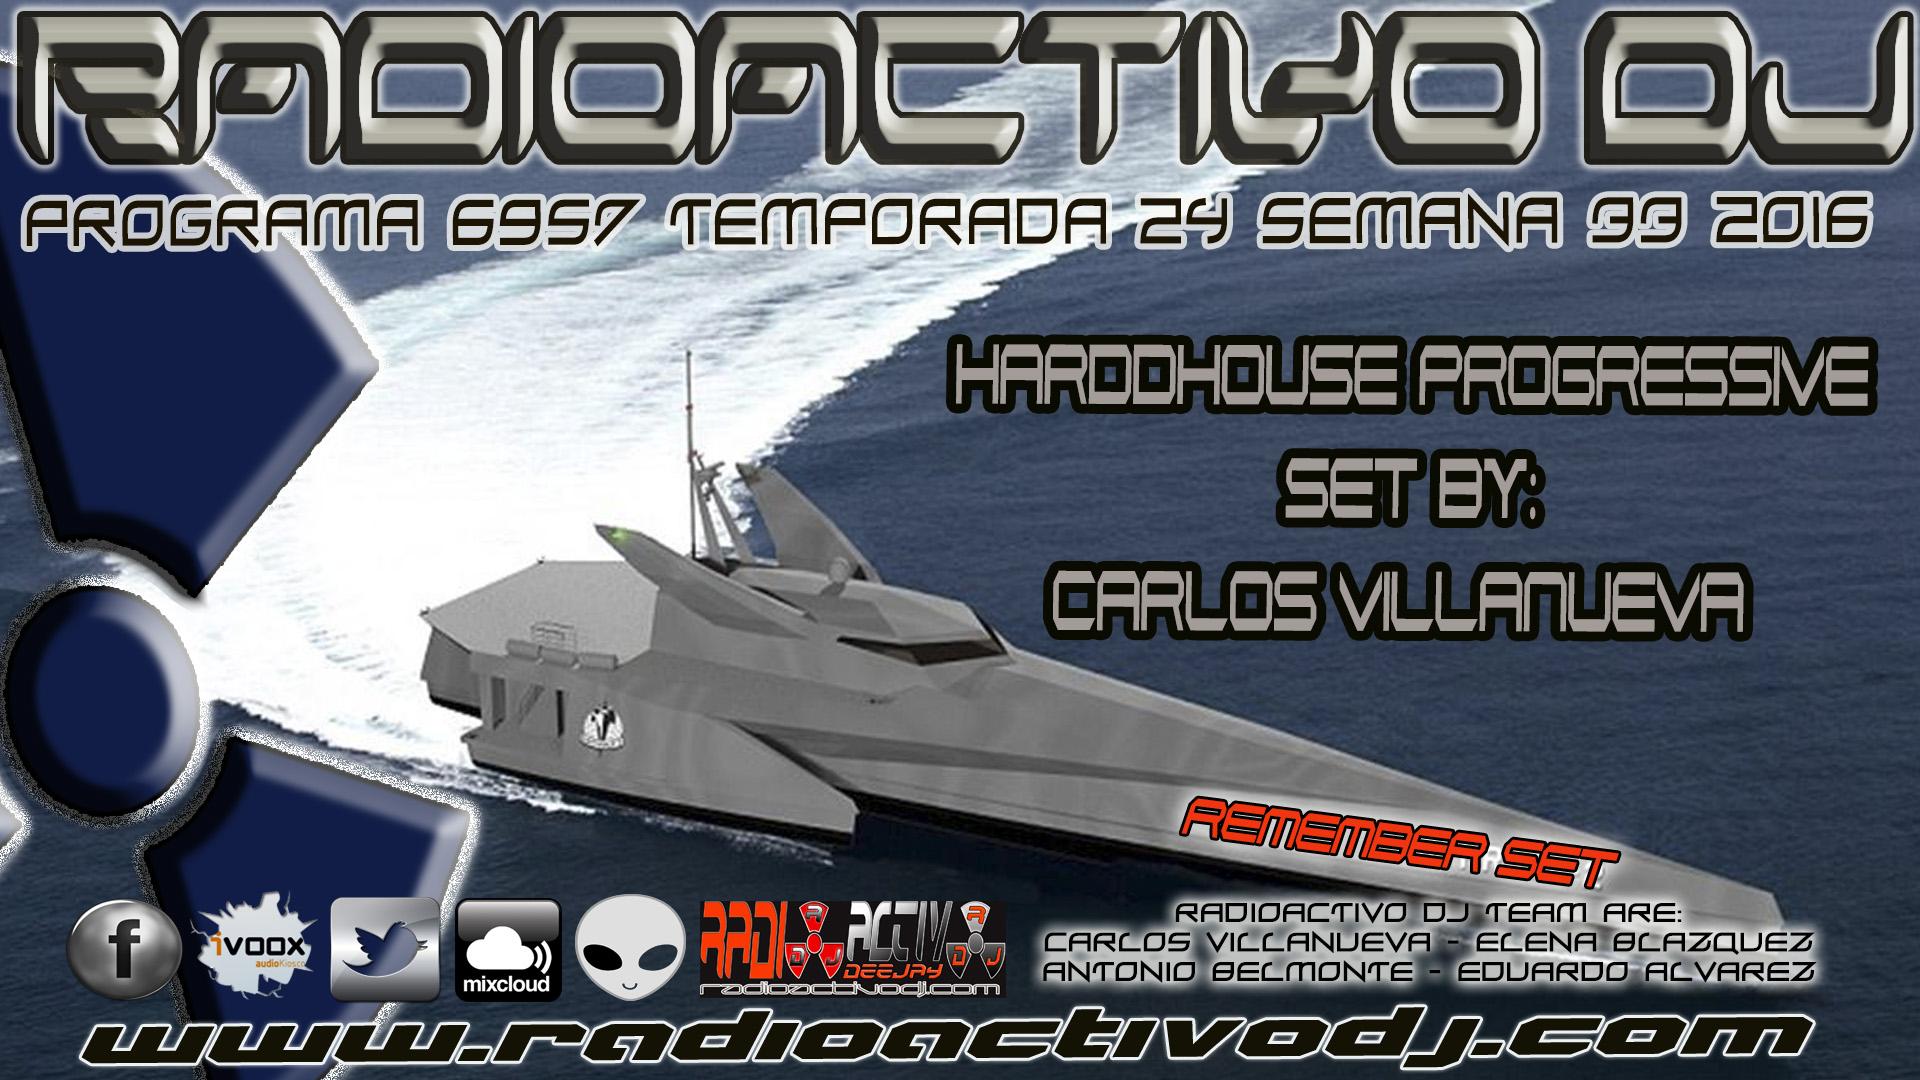 RADIOACTIVO-DJ-33-2016